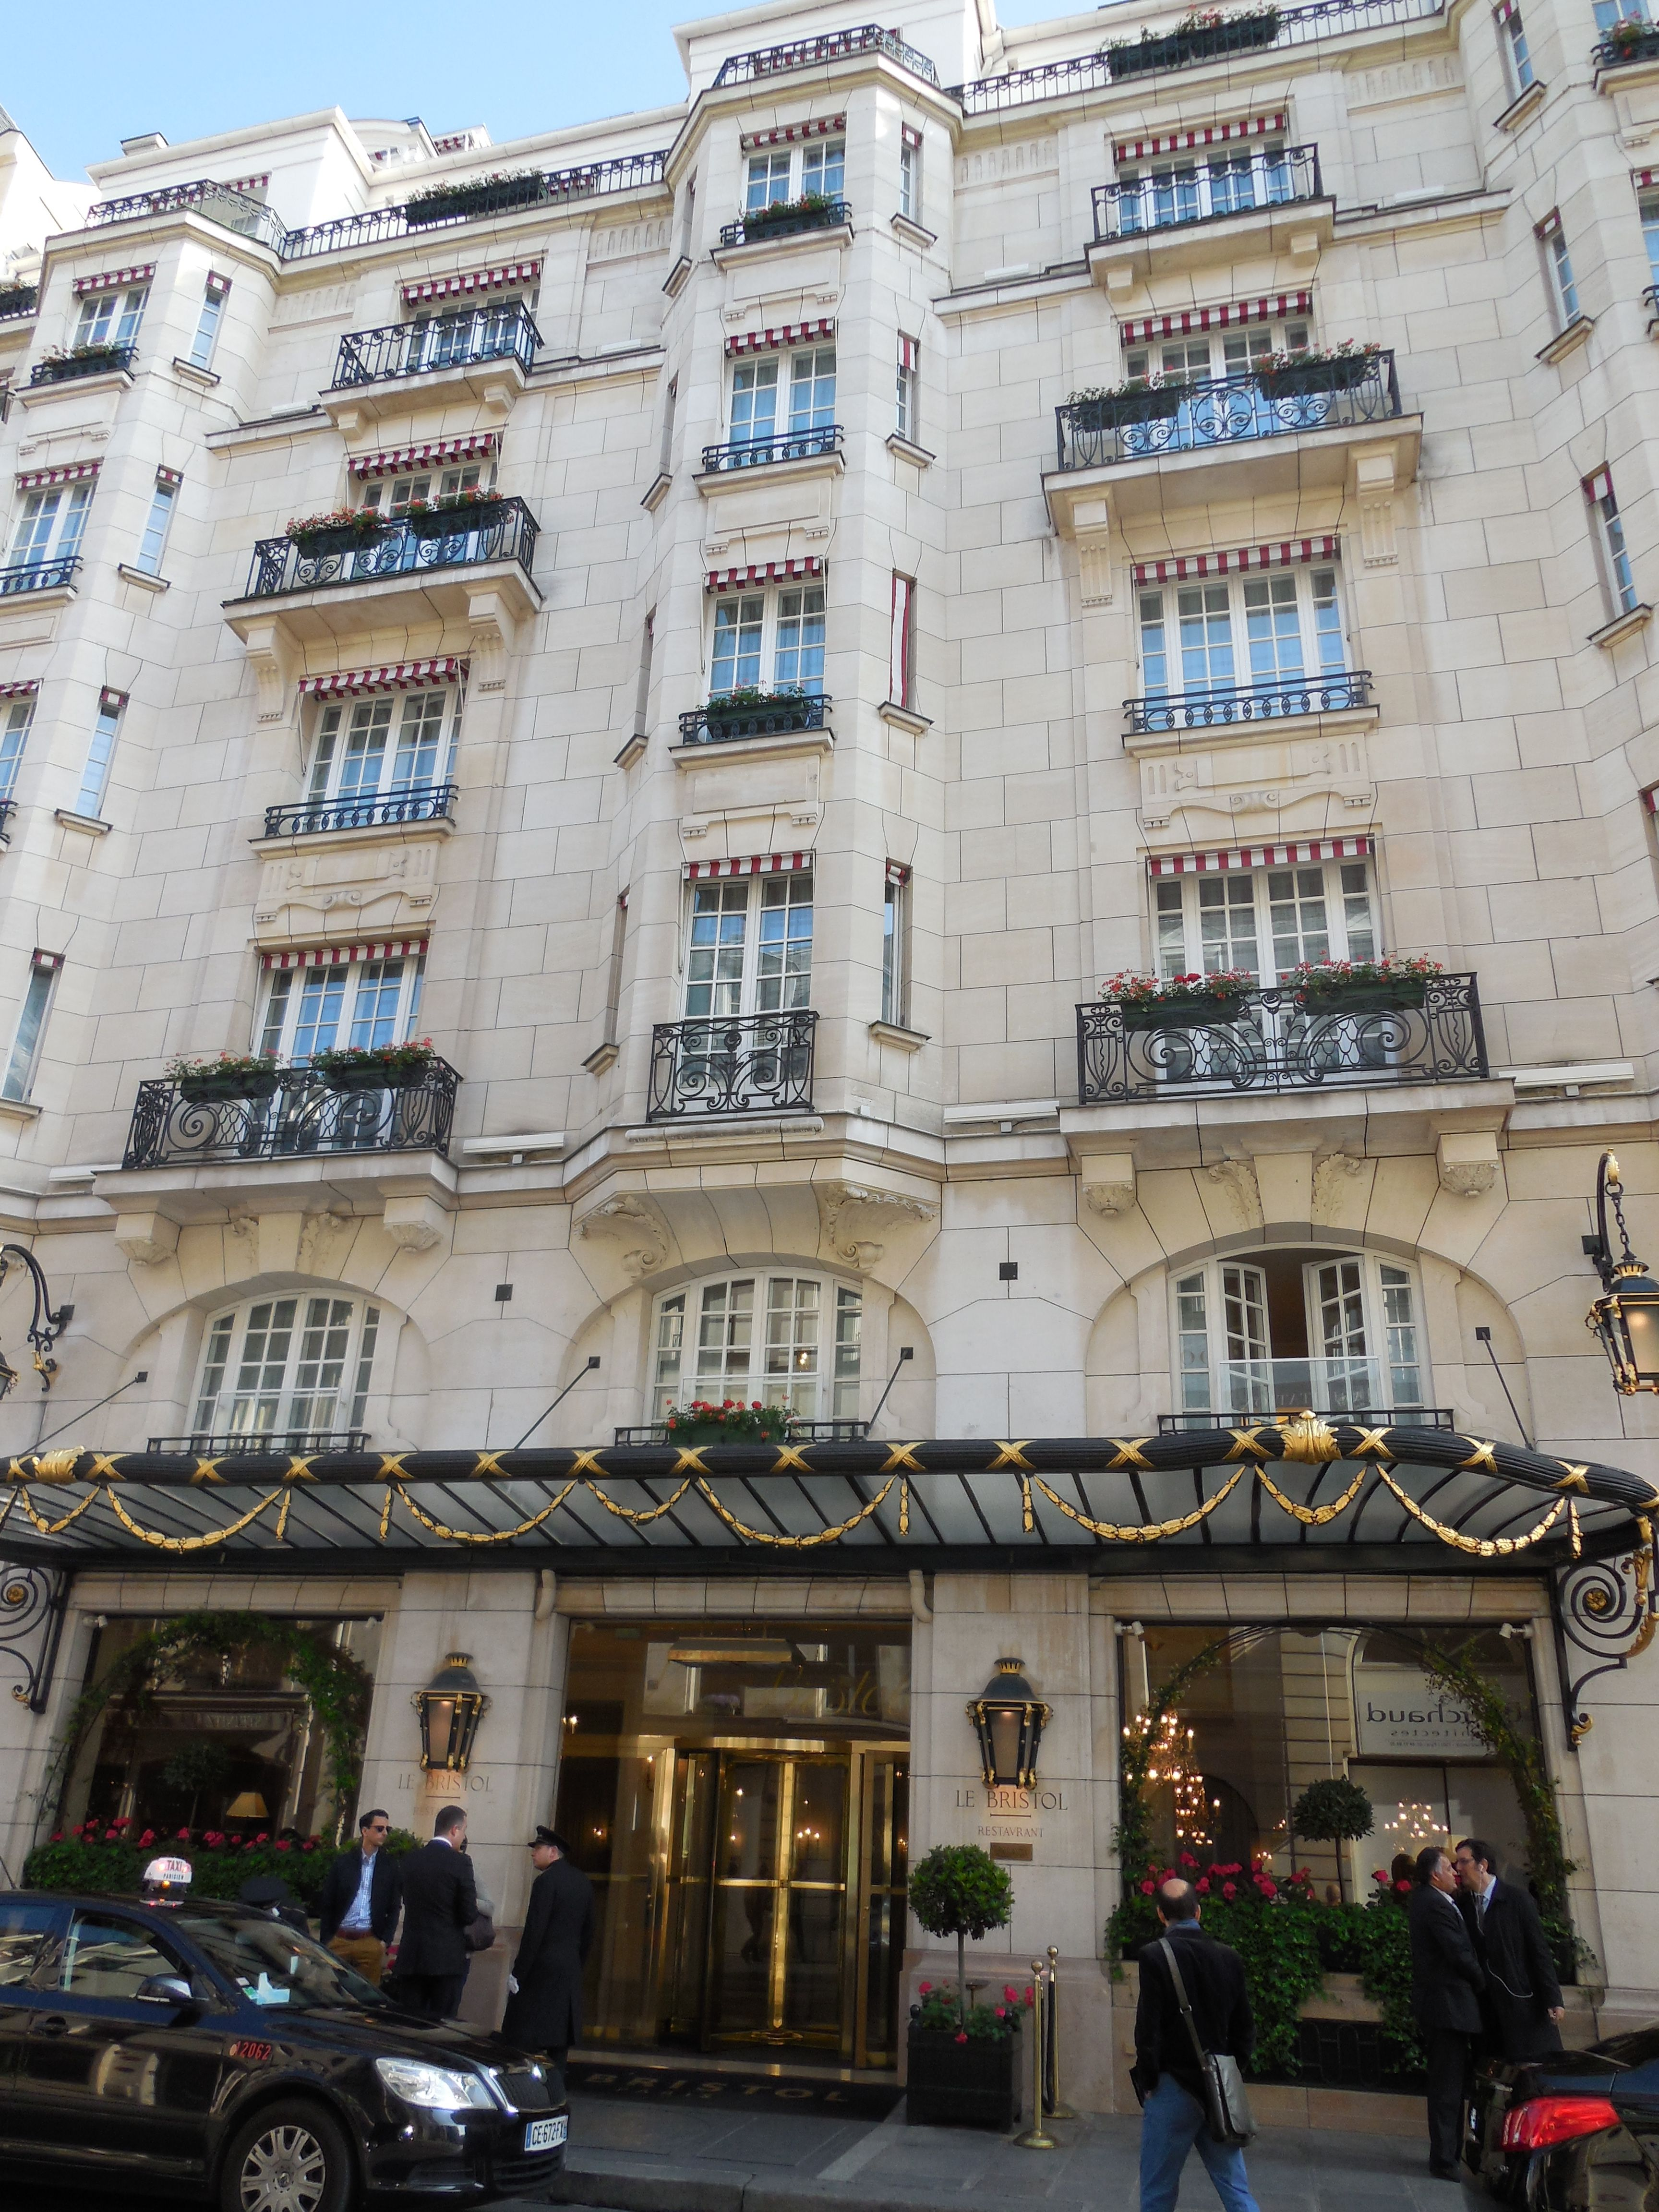 Le Bristol Paris France Palace Hotel Full Of Elegant